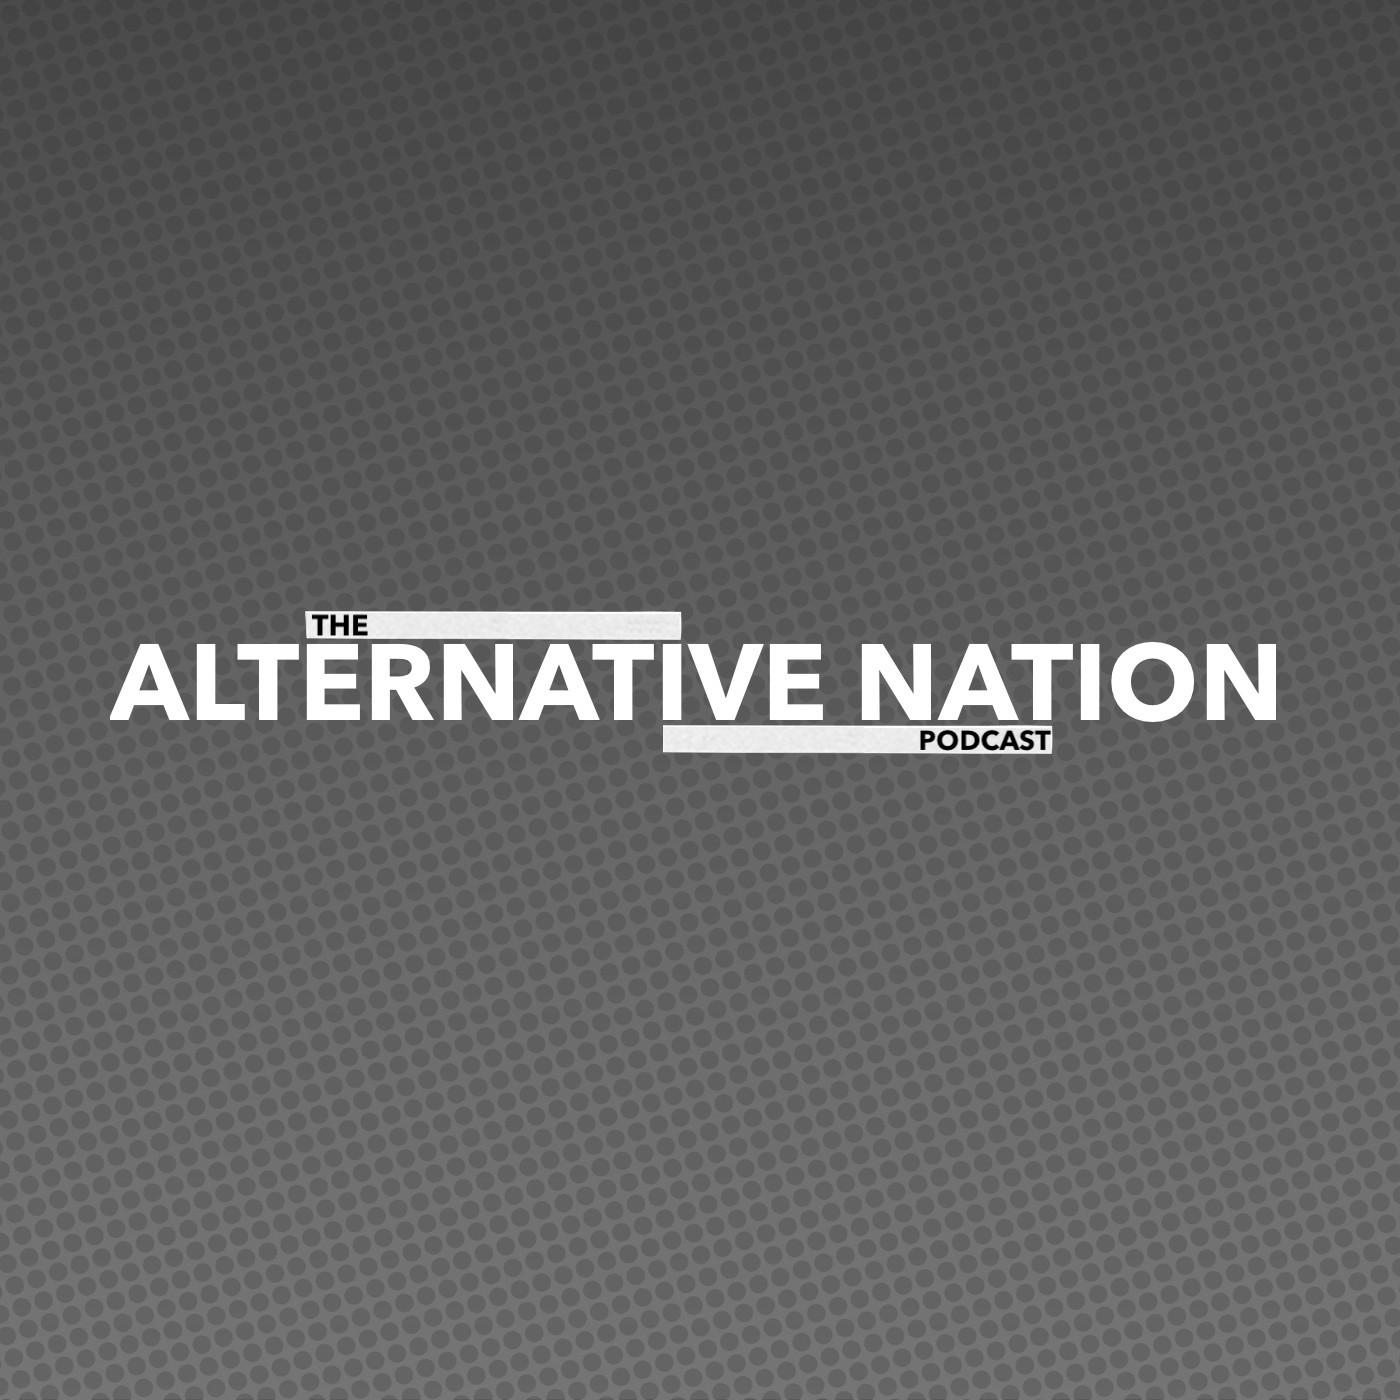 The Alternative Nation Podcast